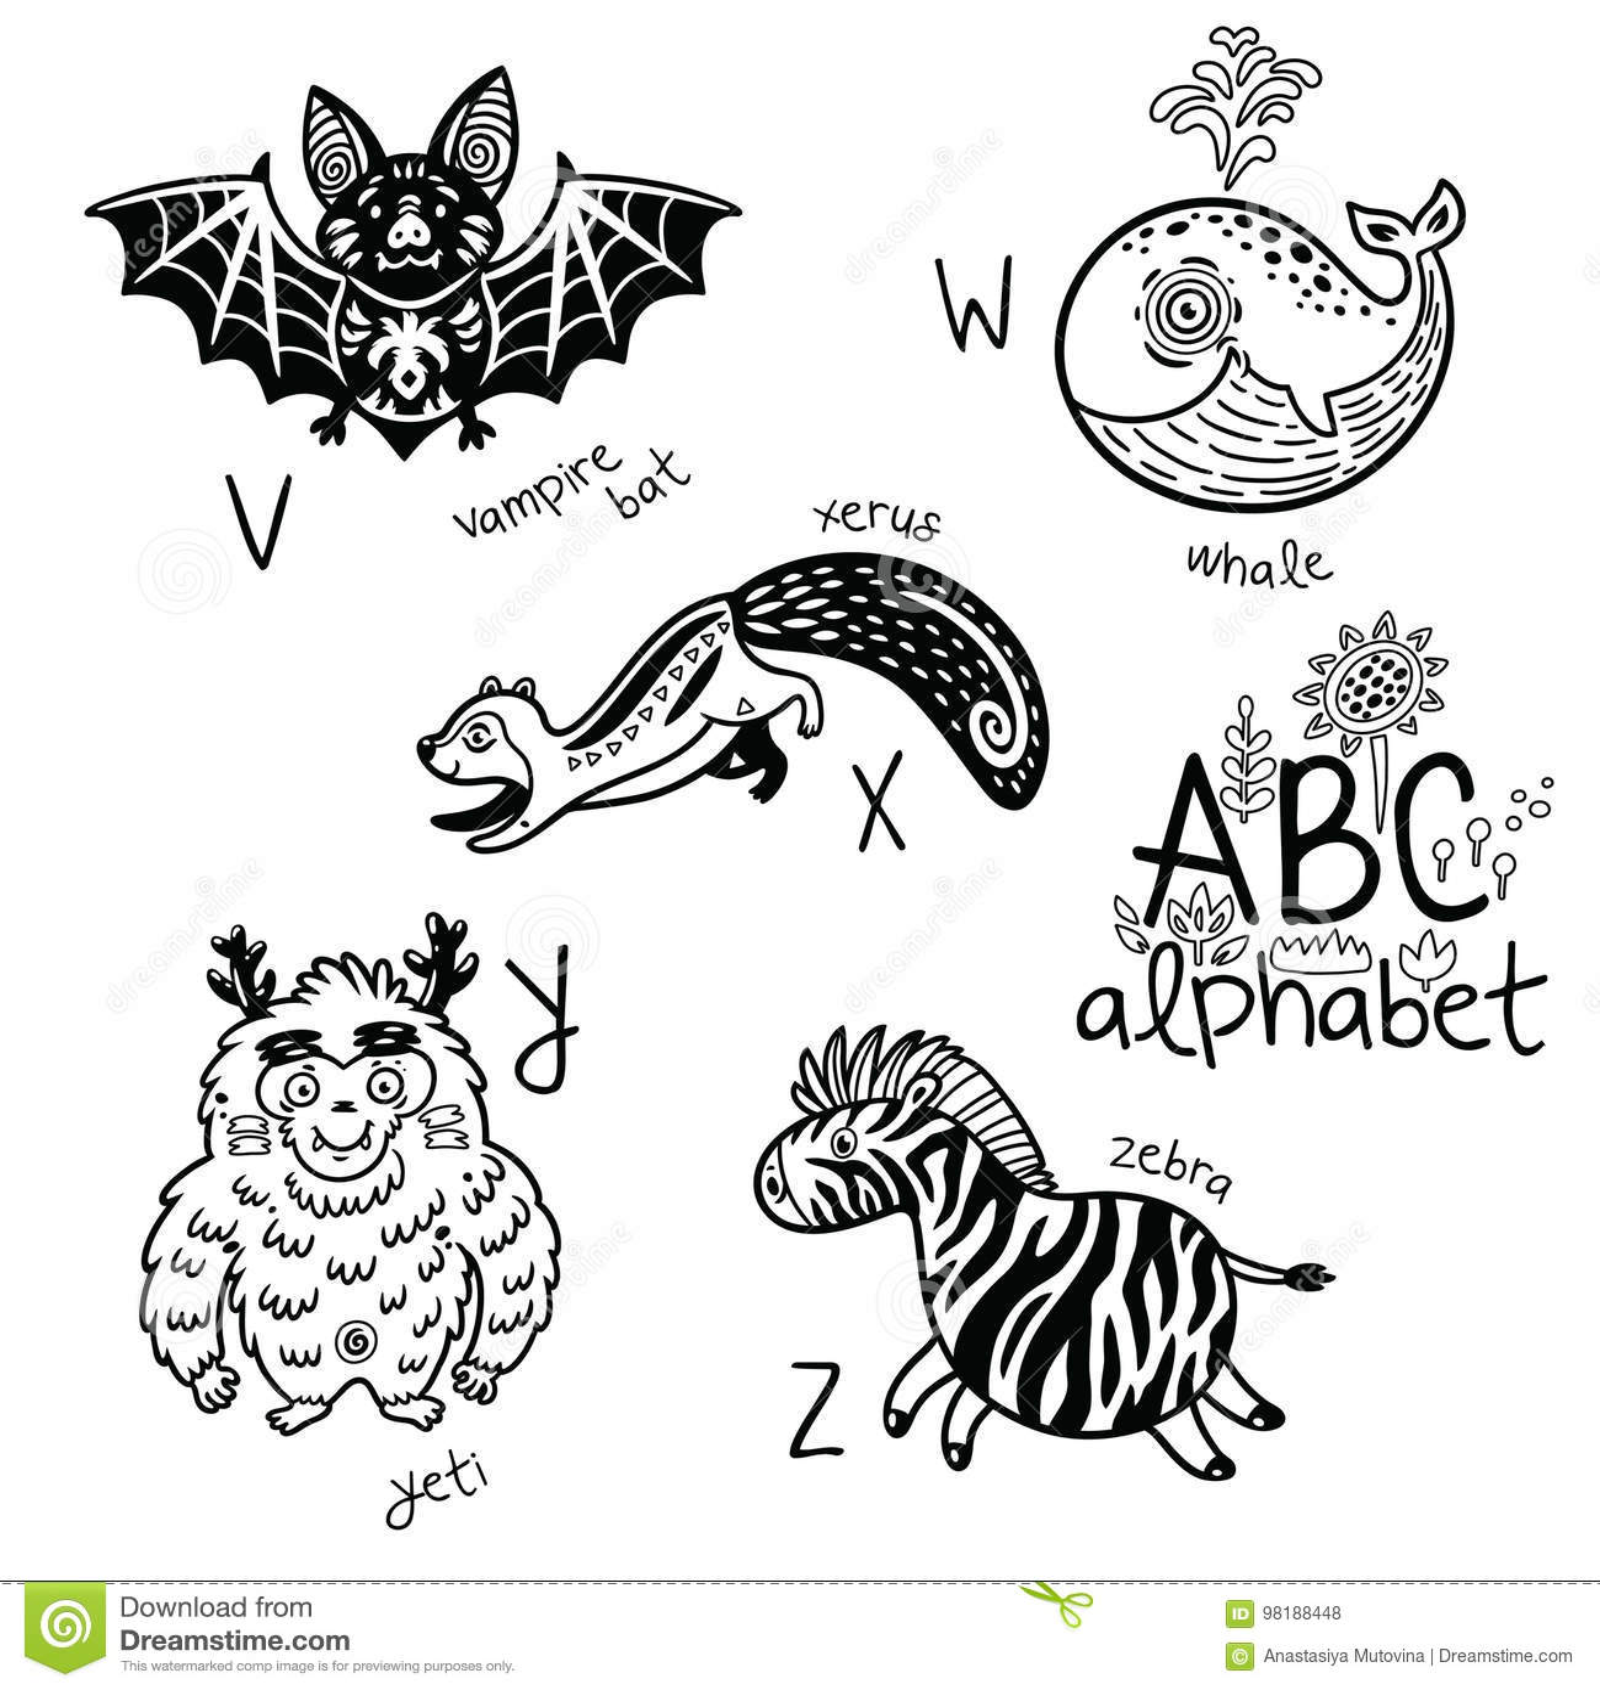 Zebra, Letter Z Coloring Page Cartoon Vector